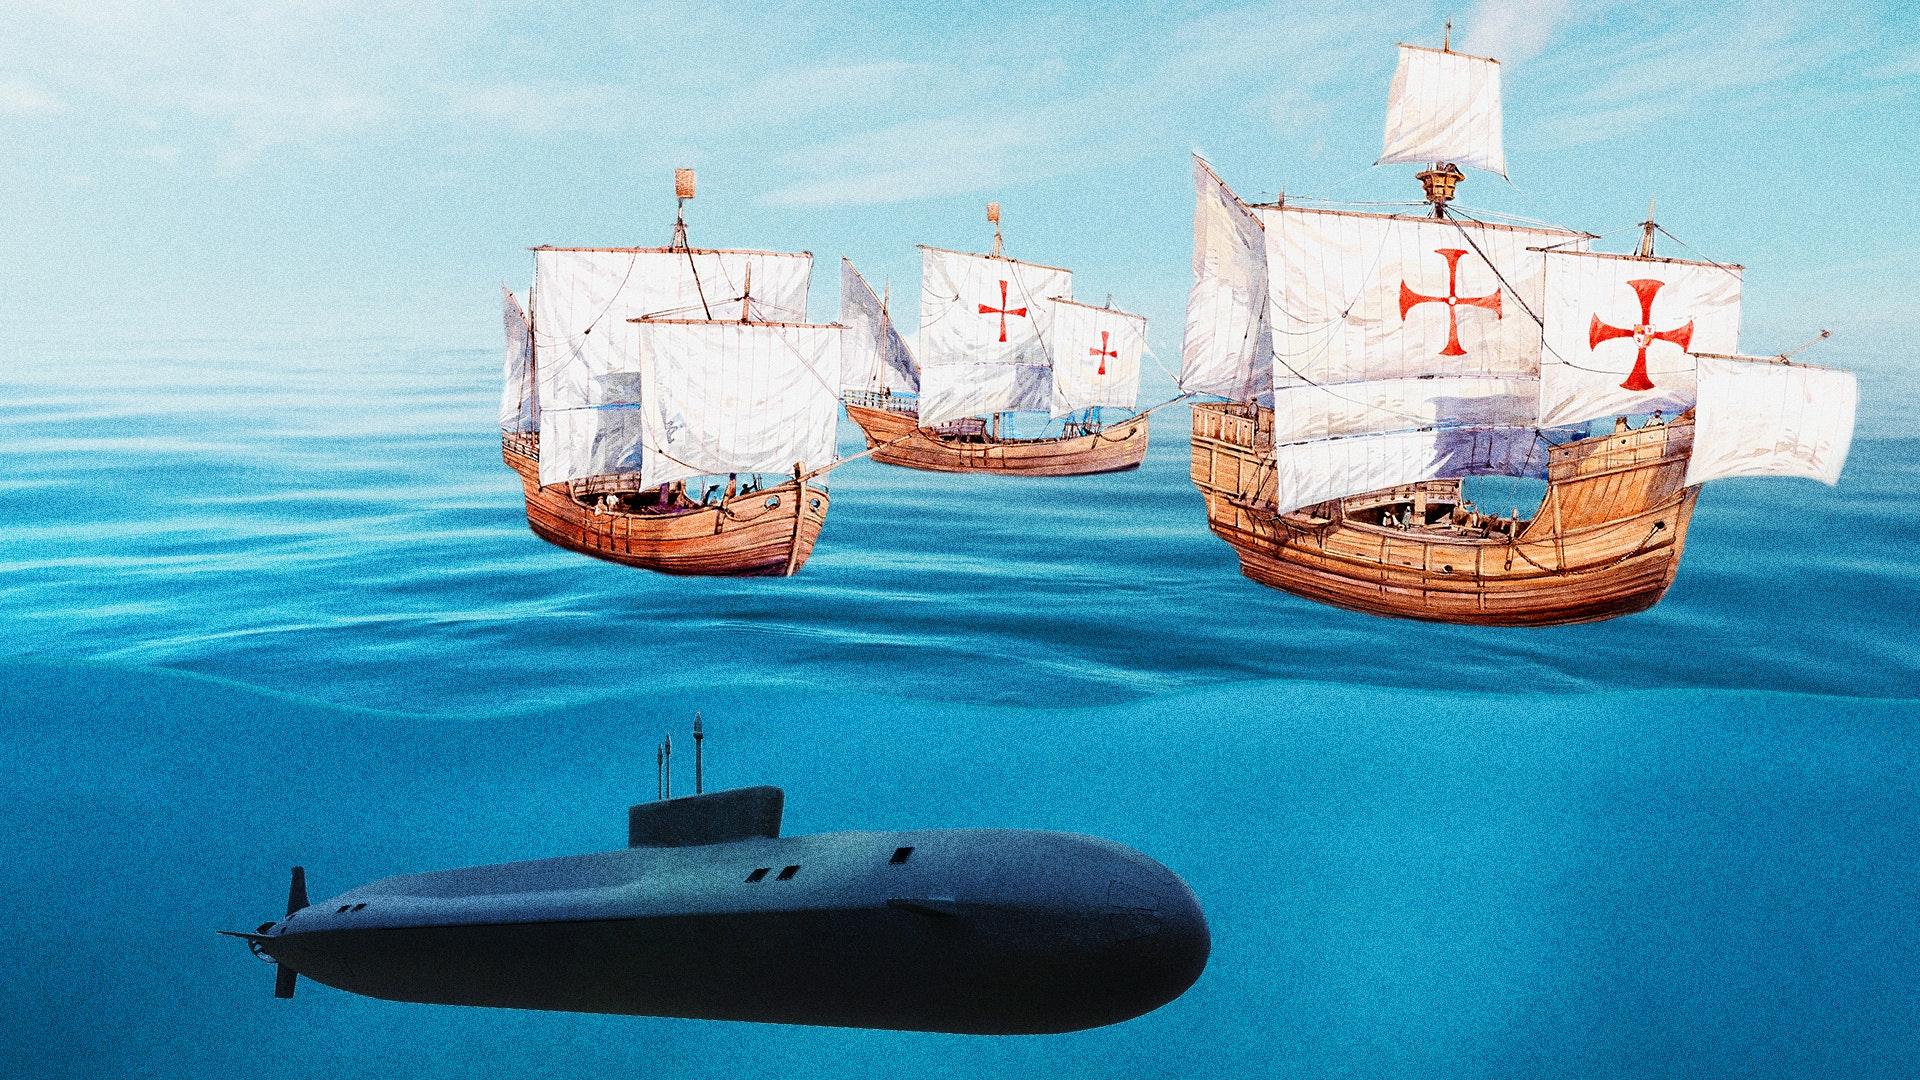 Ep. 1351 -Yes, Happy Columbus Day